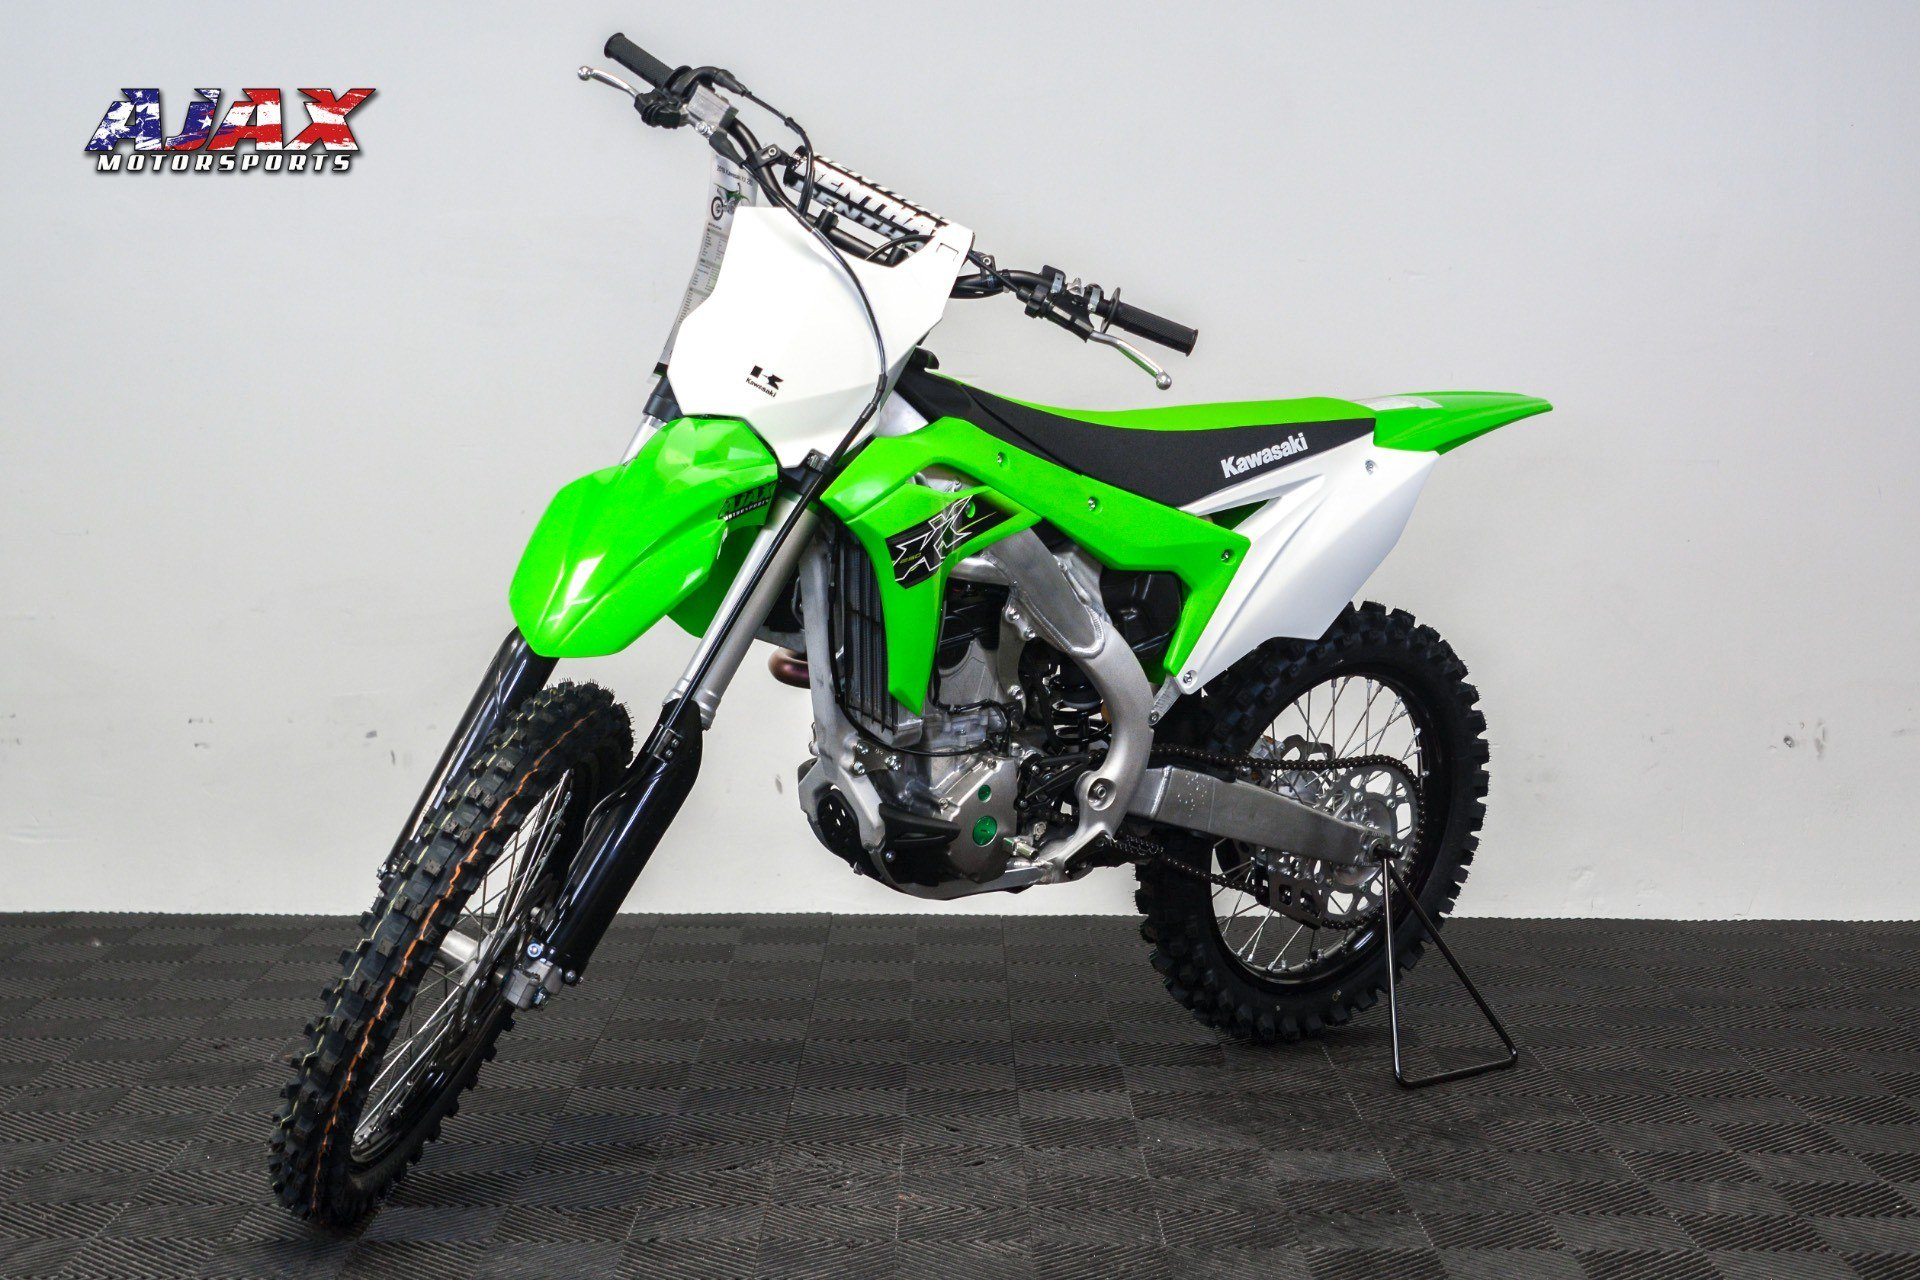 New 2019 Kawasaki Kx 250 Motorcycles In Oklahoma City Ok Stock Kx250 Wiring Harness